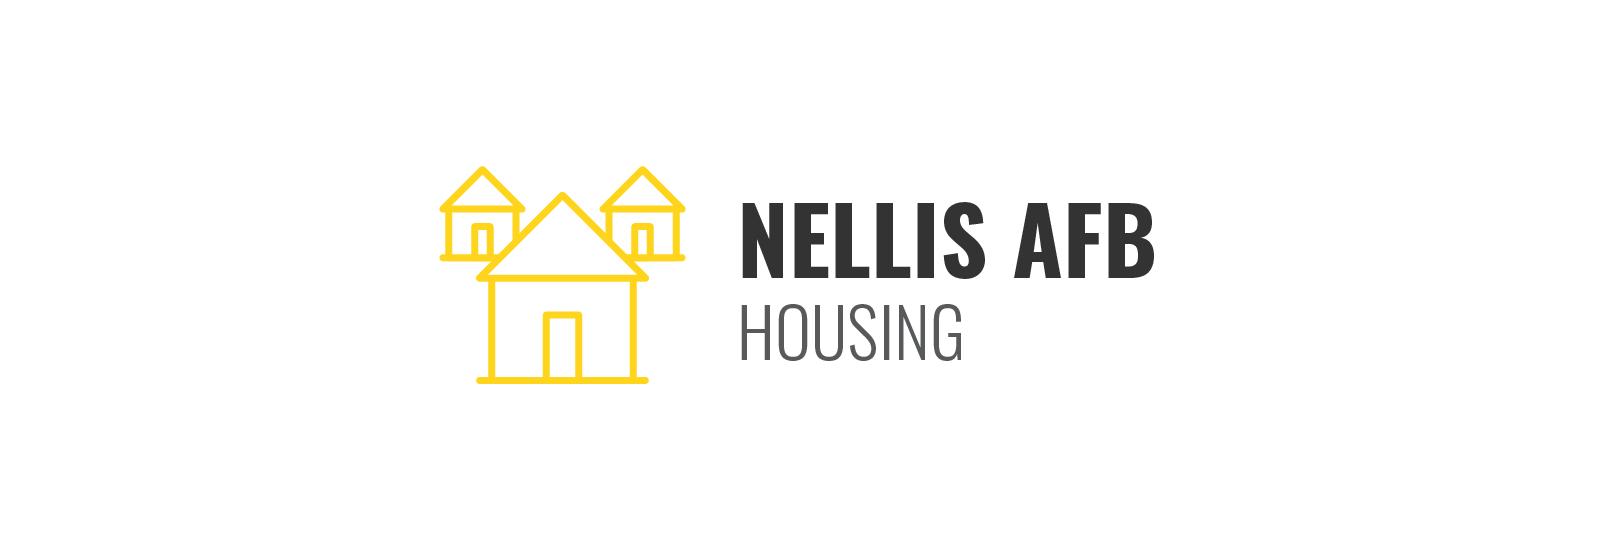 Nellis AFB Housing